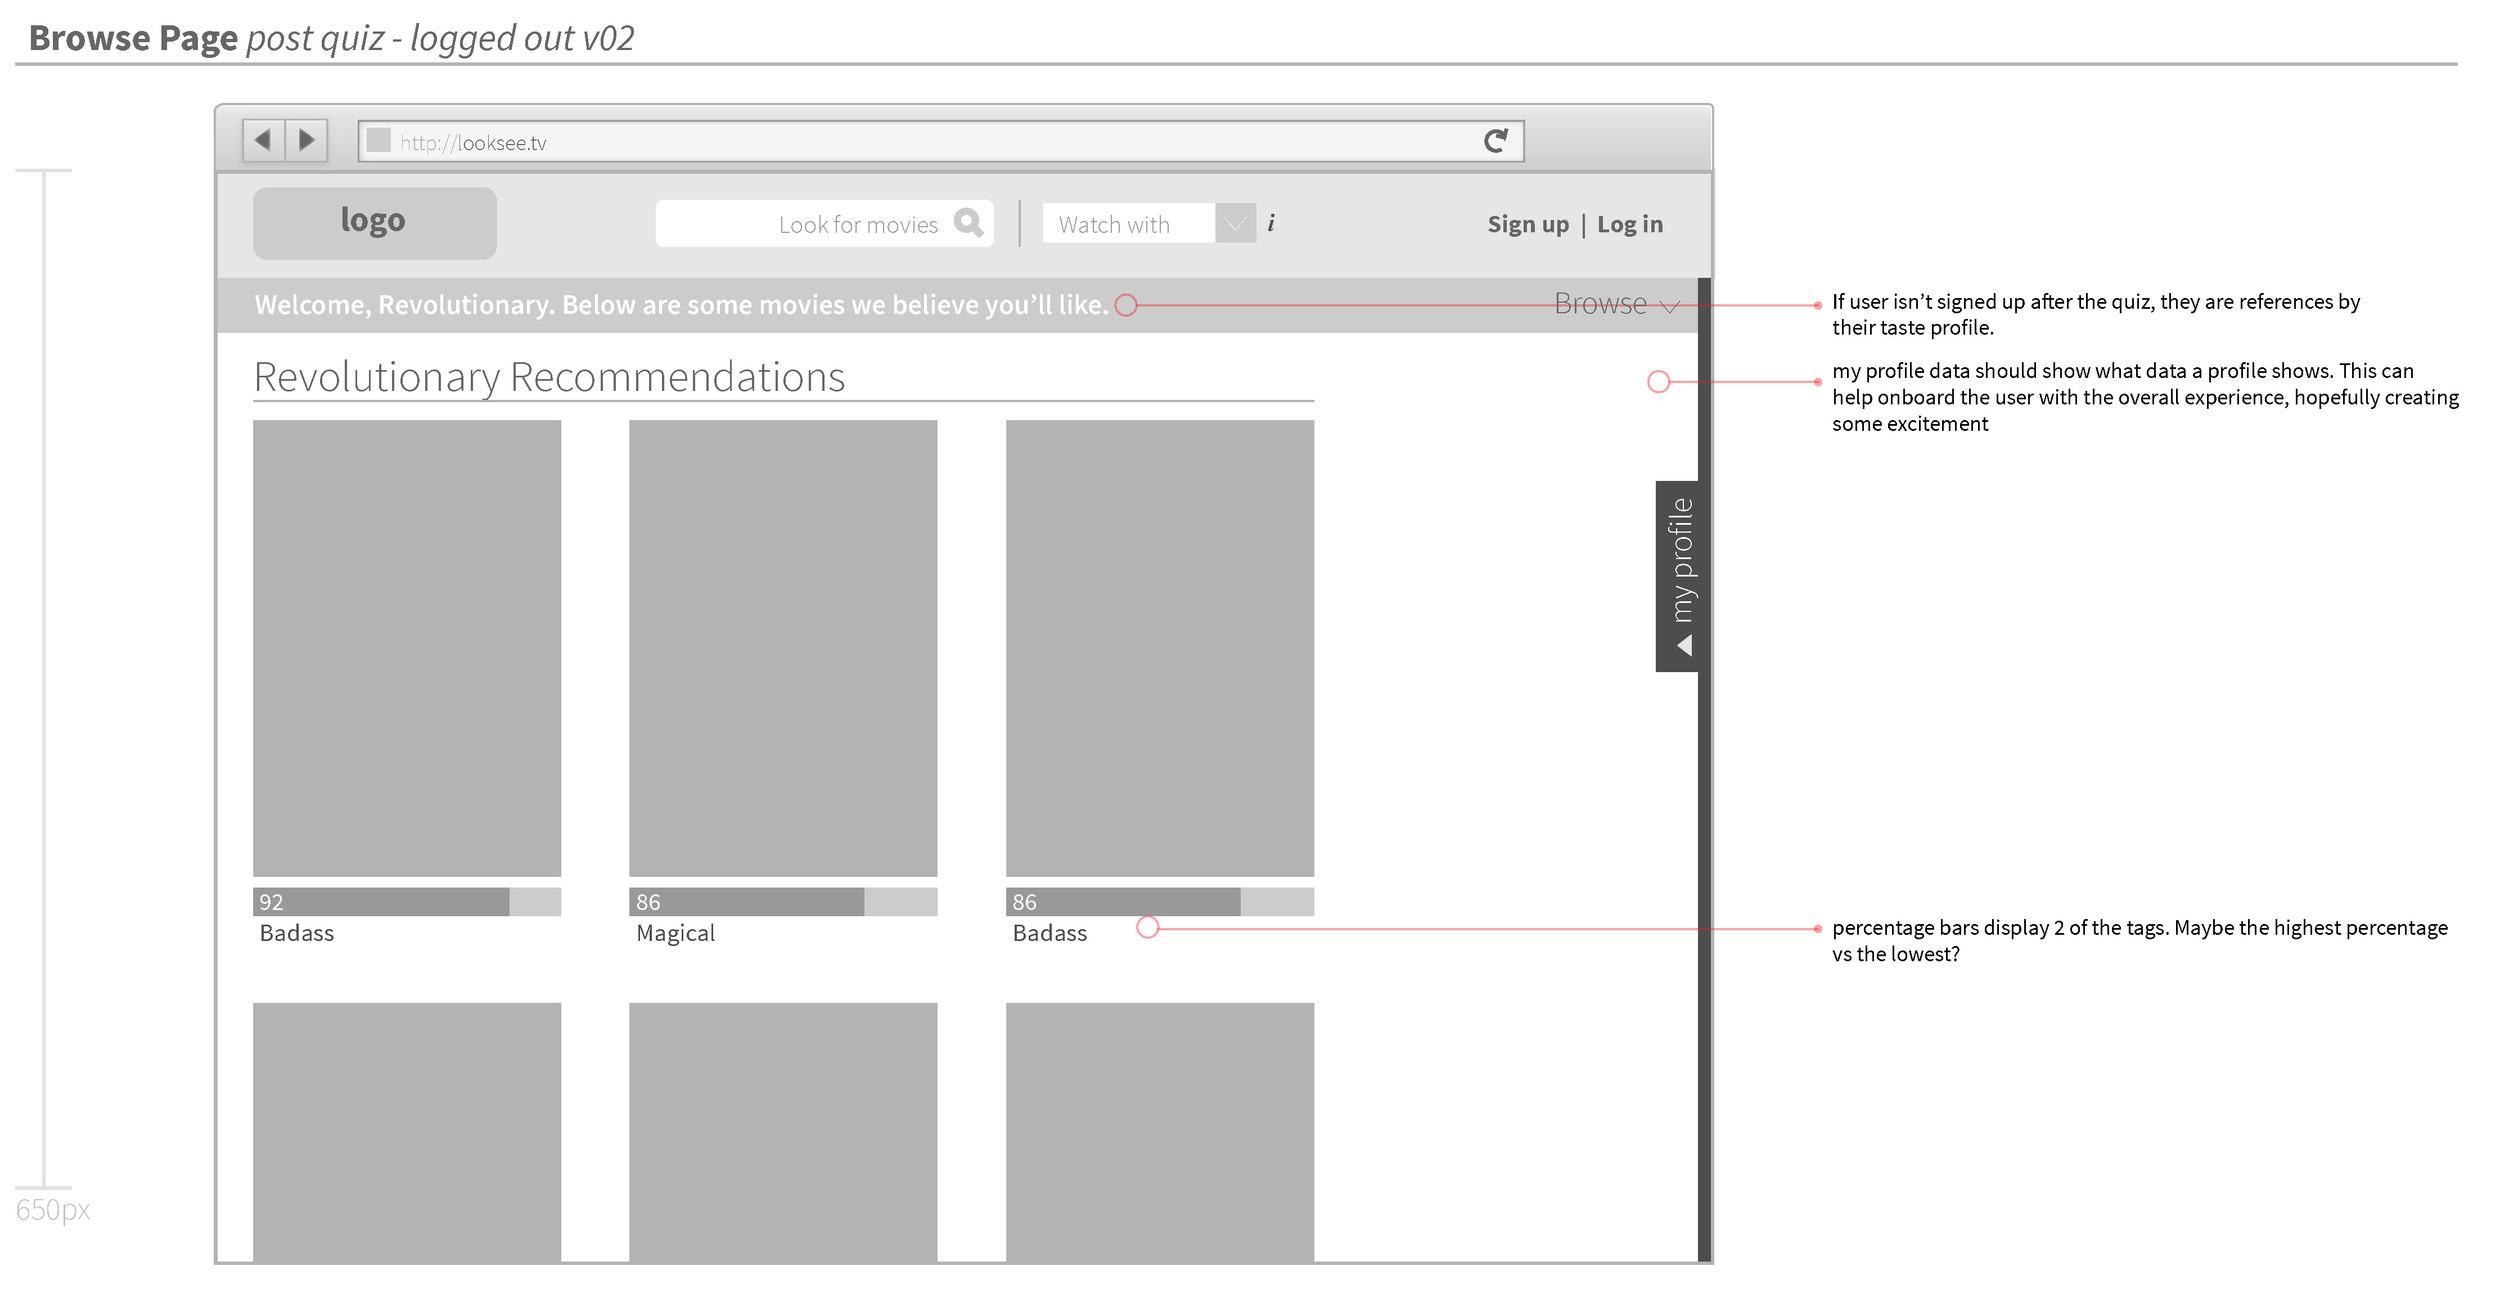 looksee_wireframe_v4_Page_08.jpg